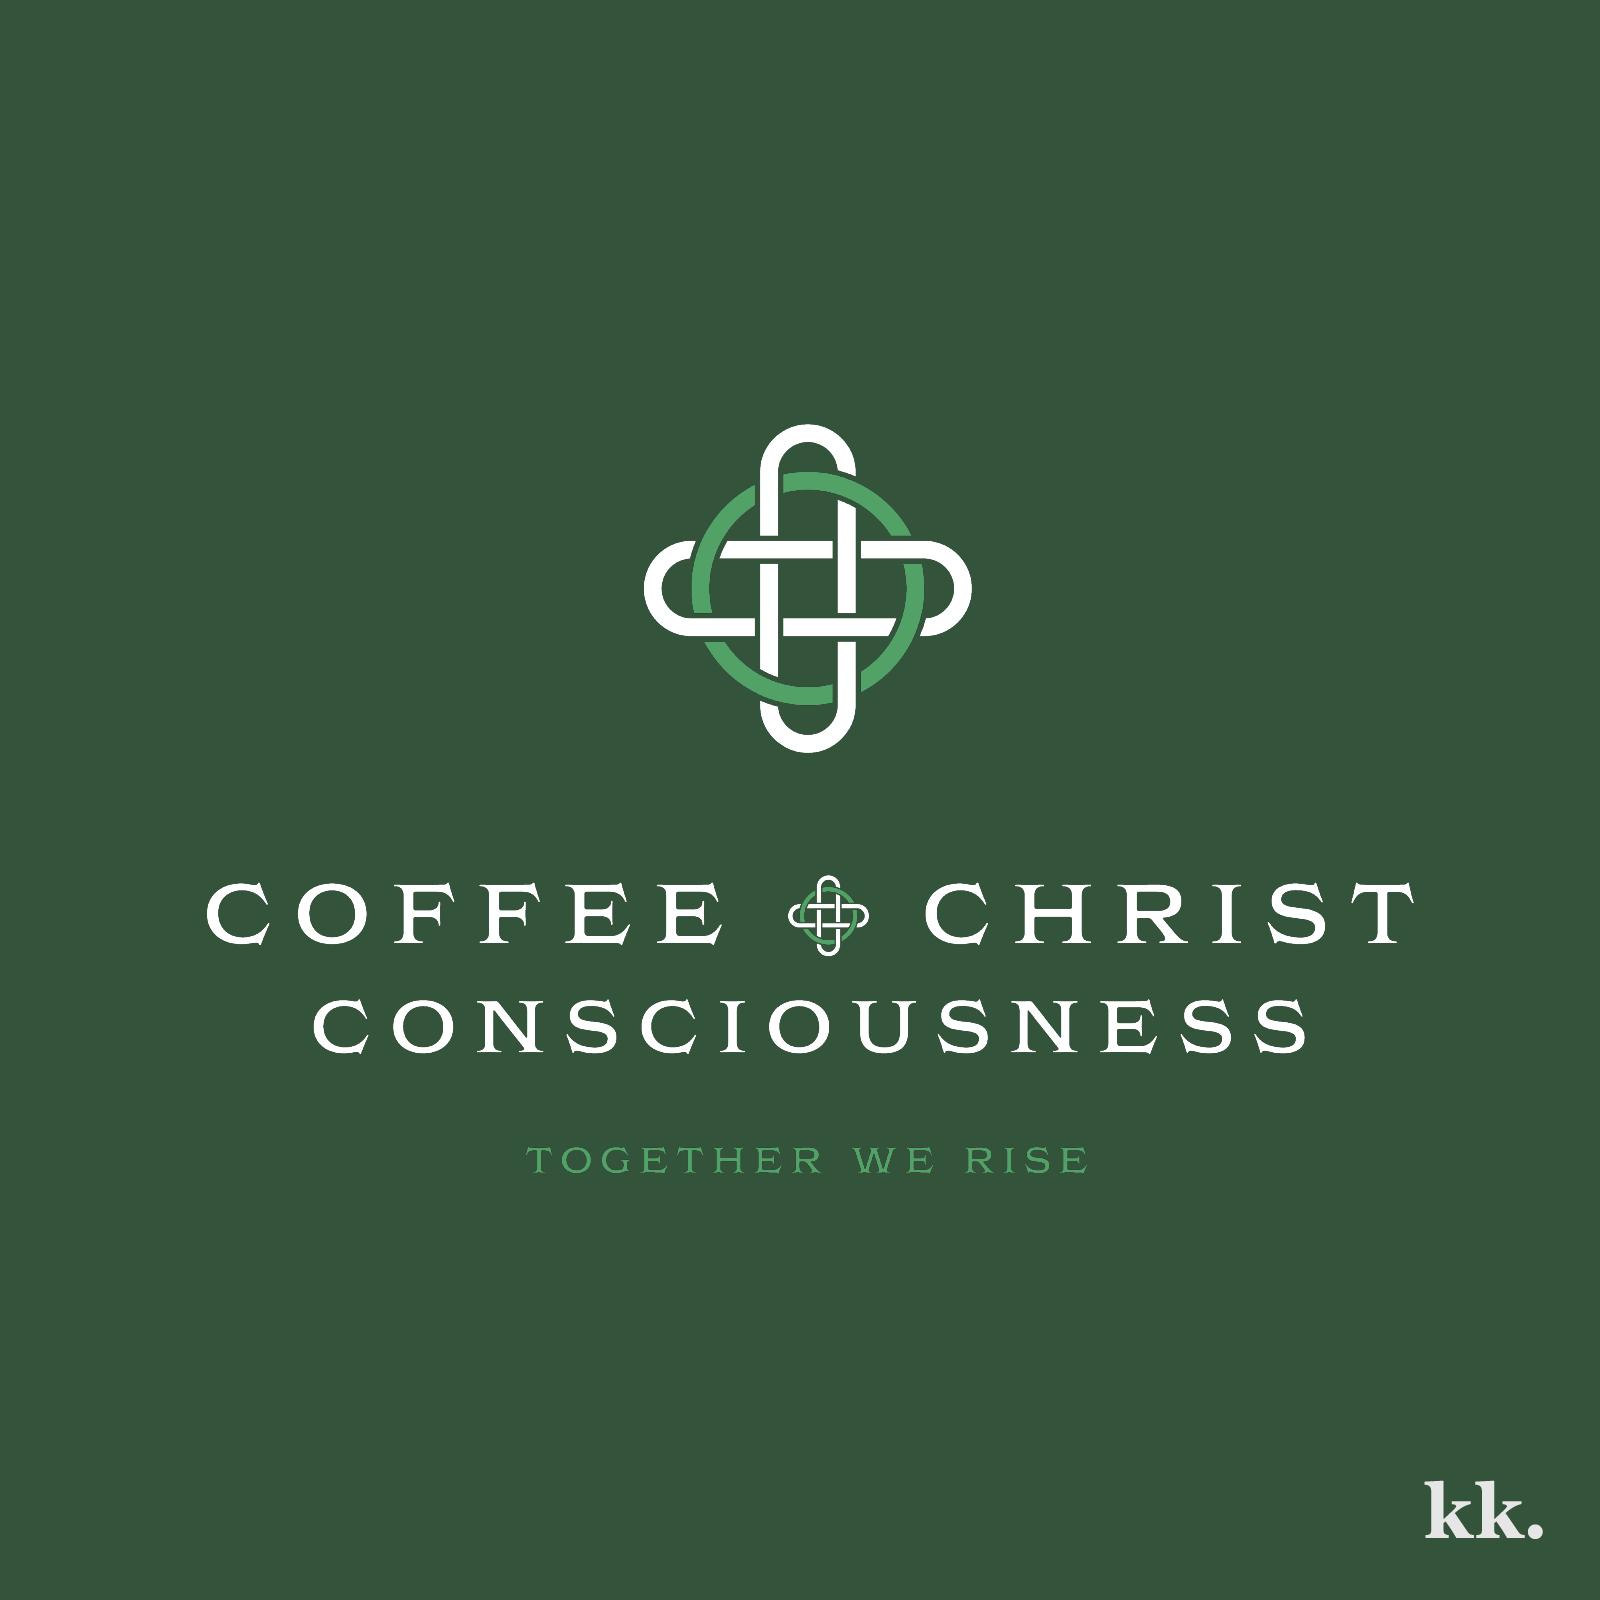 Coffee & Christ Consciousness Logo | Katie Kassel, Kassel Creative